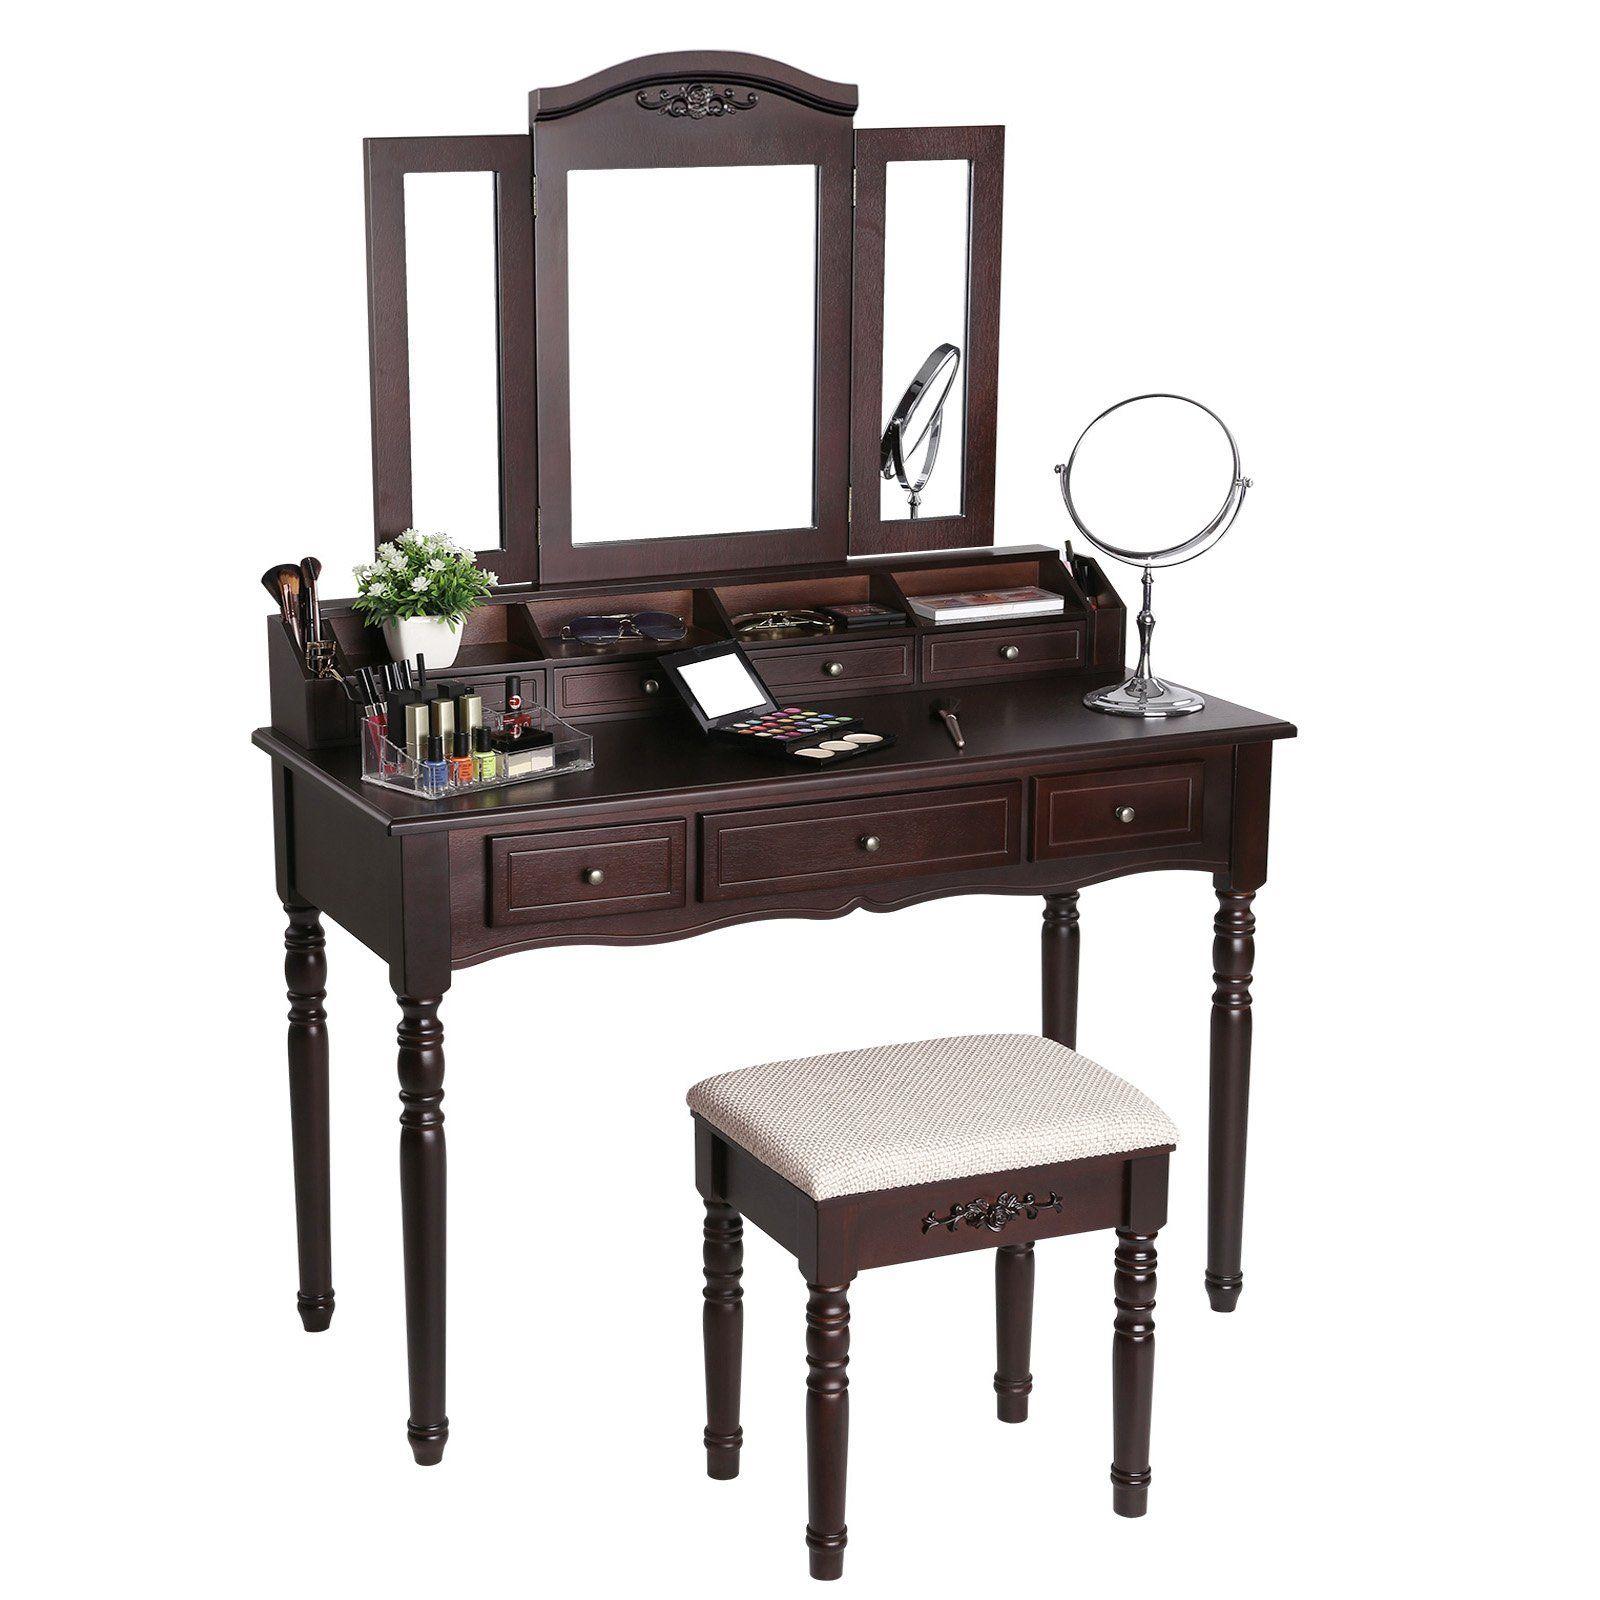 Makeup Vanity Jewelry Dressing Table Set Tri-Folding Mirror Stool Desk w// Drawer